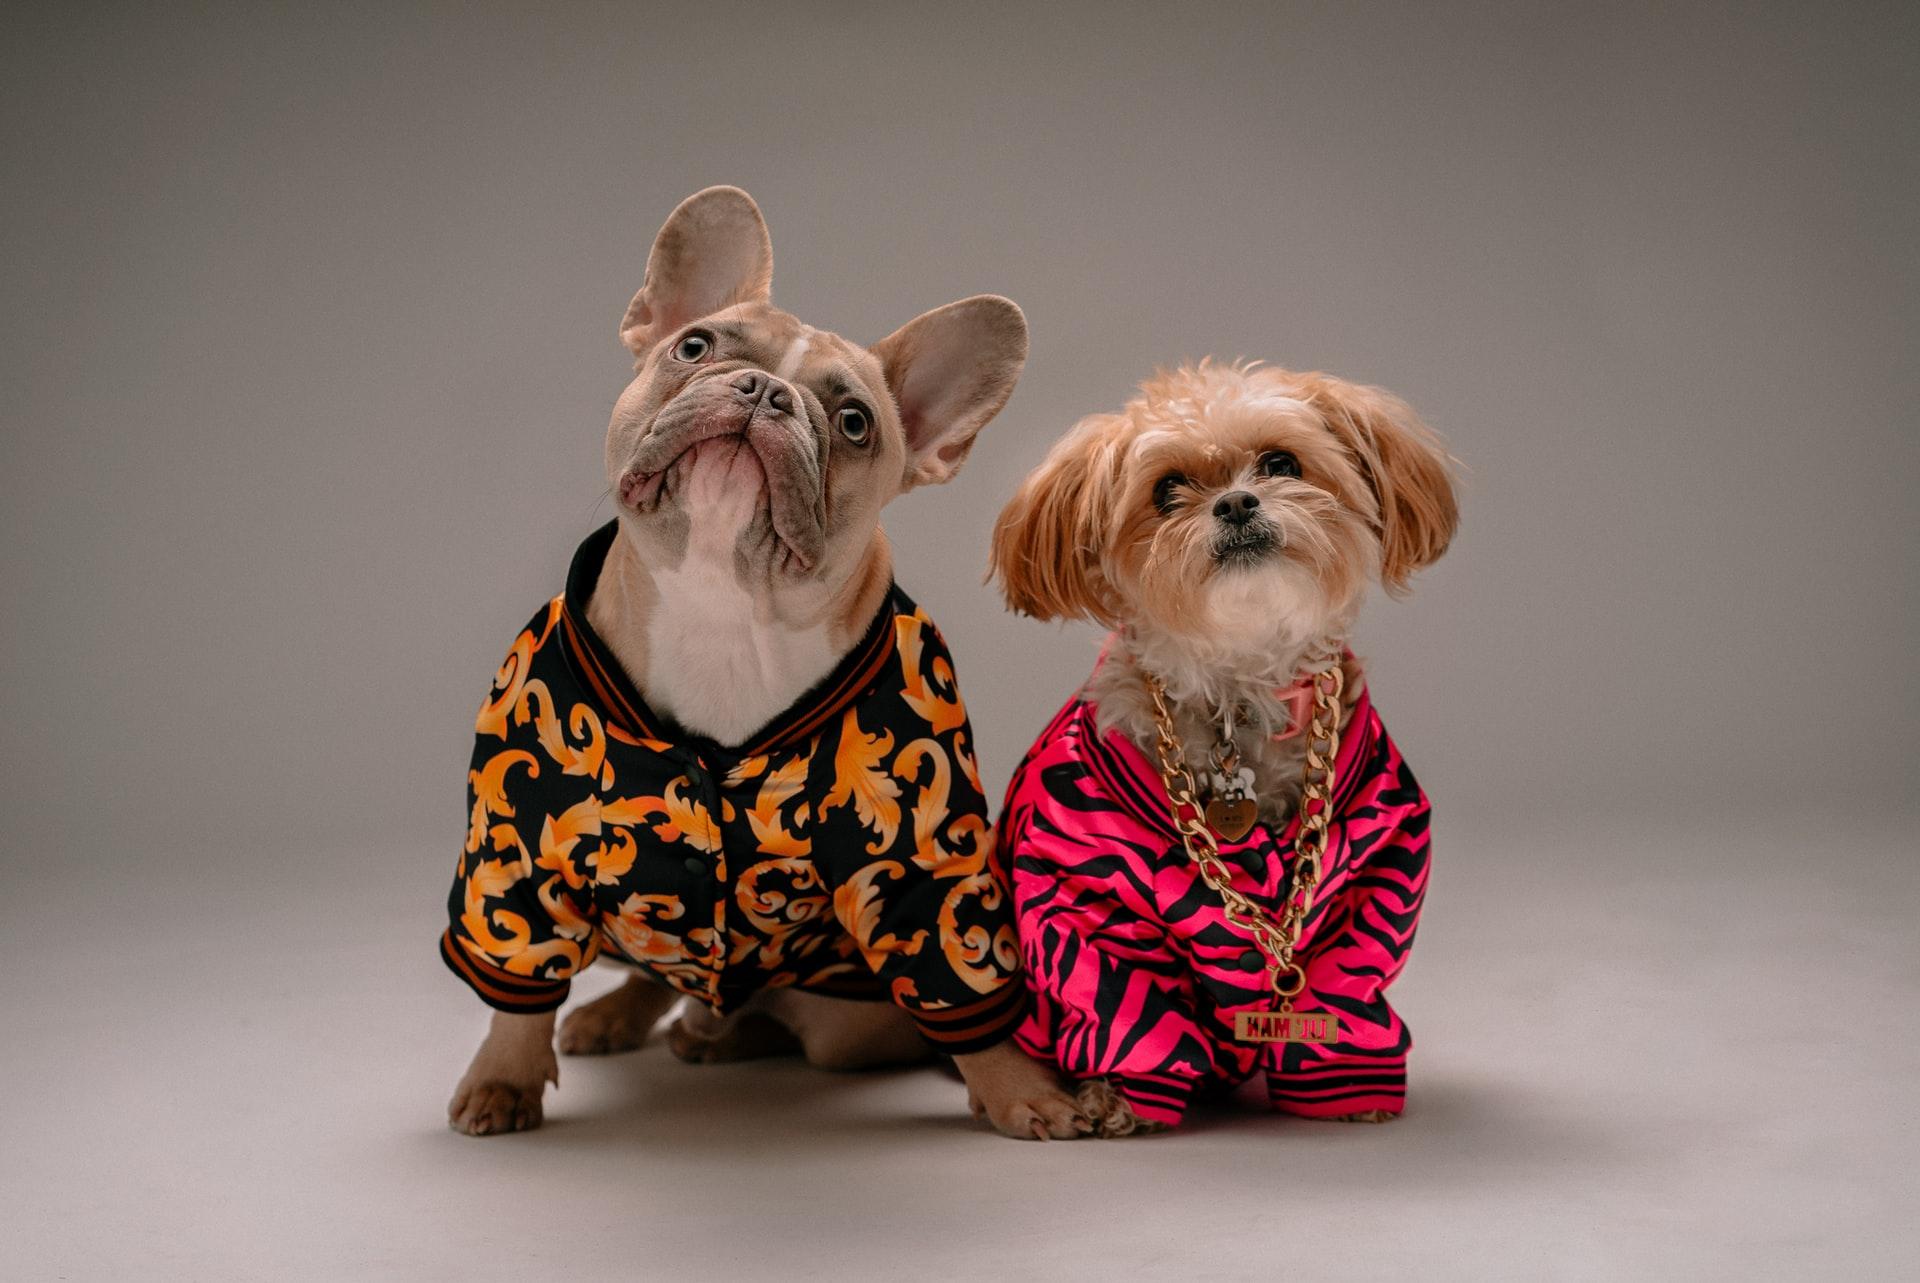 10 Delightful Dogs To Follow On Instagram